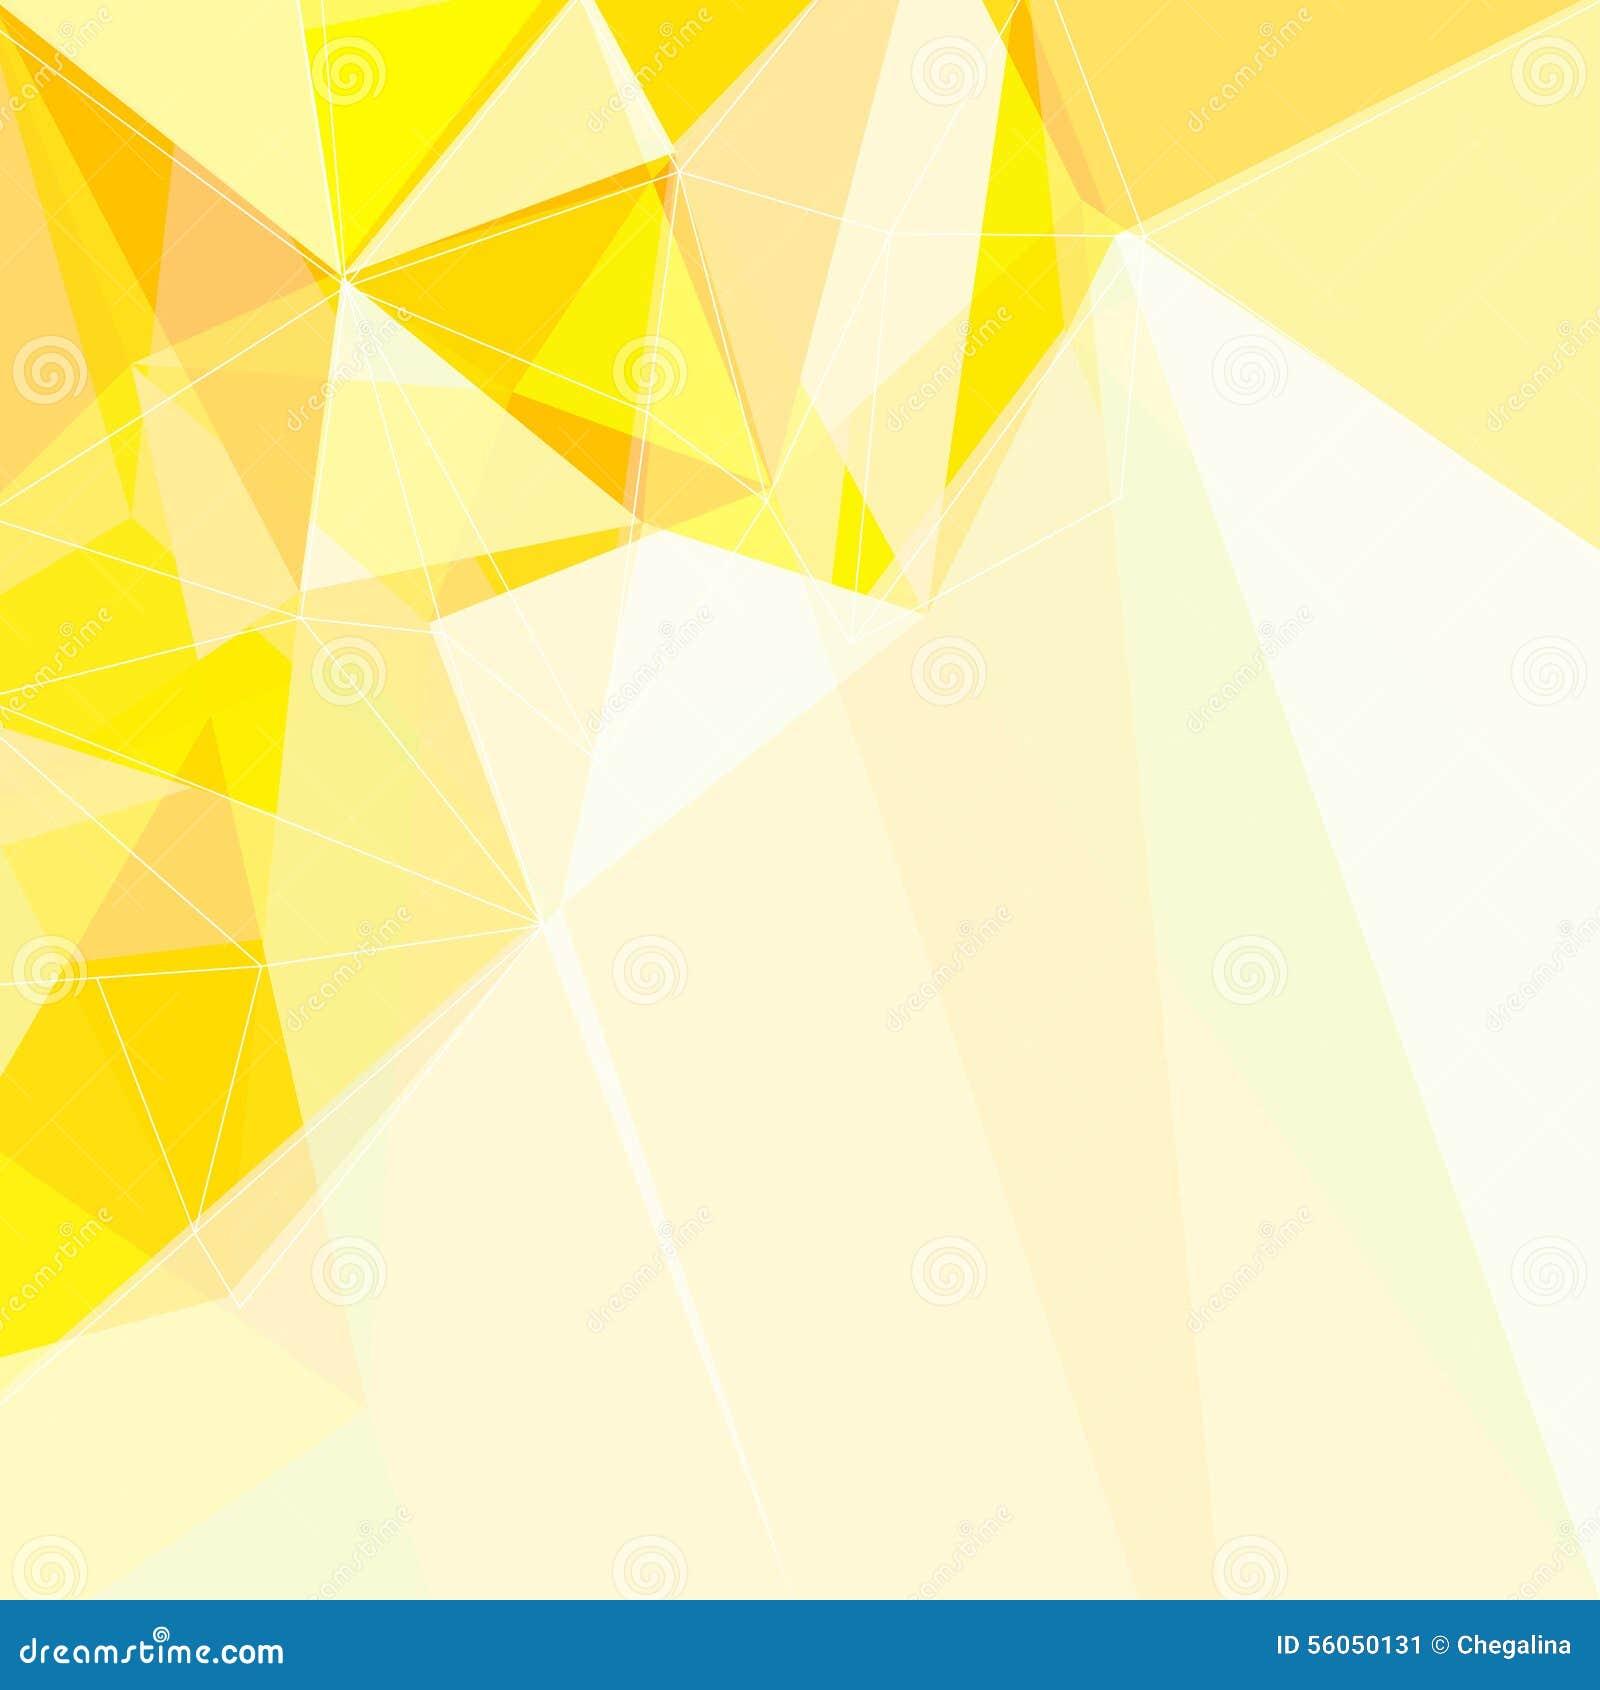 geometric yellow background illustration - photo #4